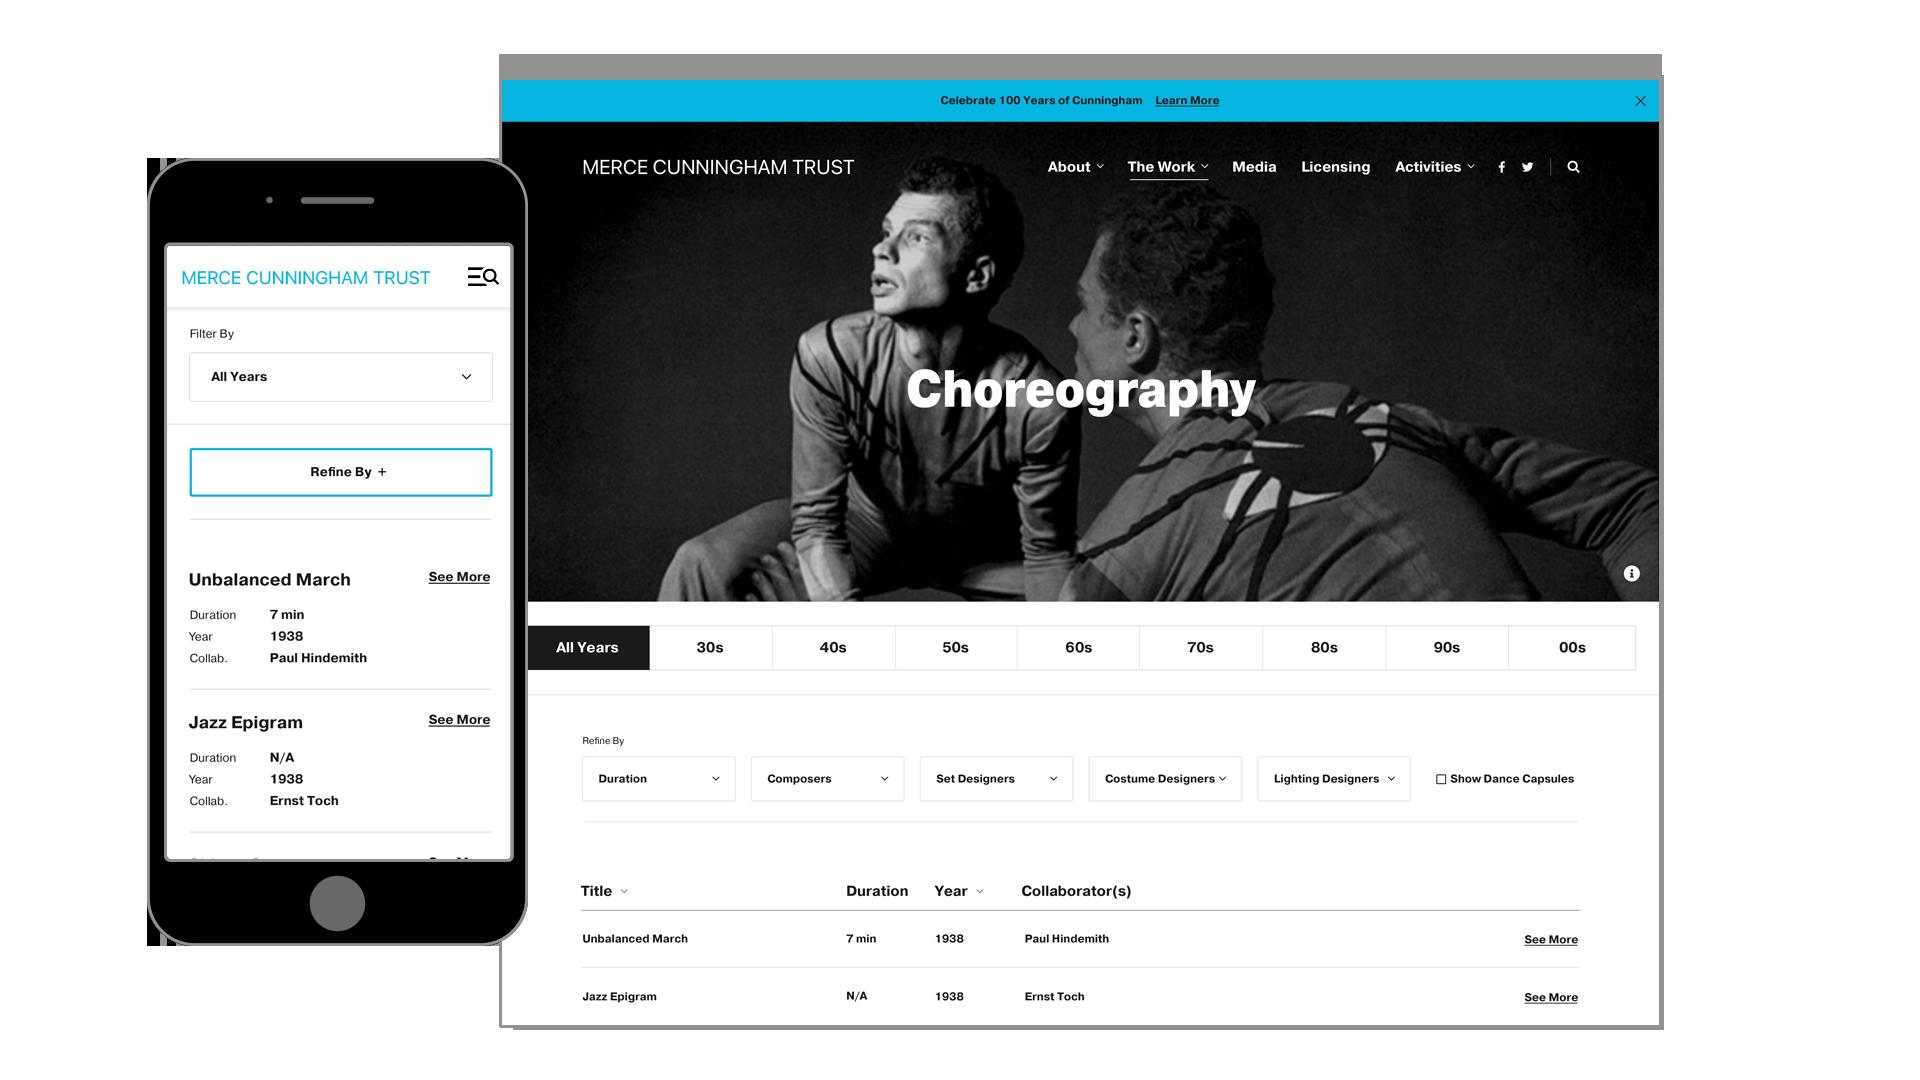 Merce Cunningham Trust Choregraphy Page Design Mockup